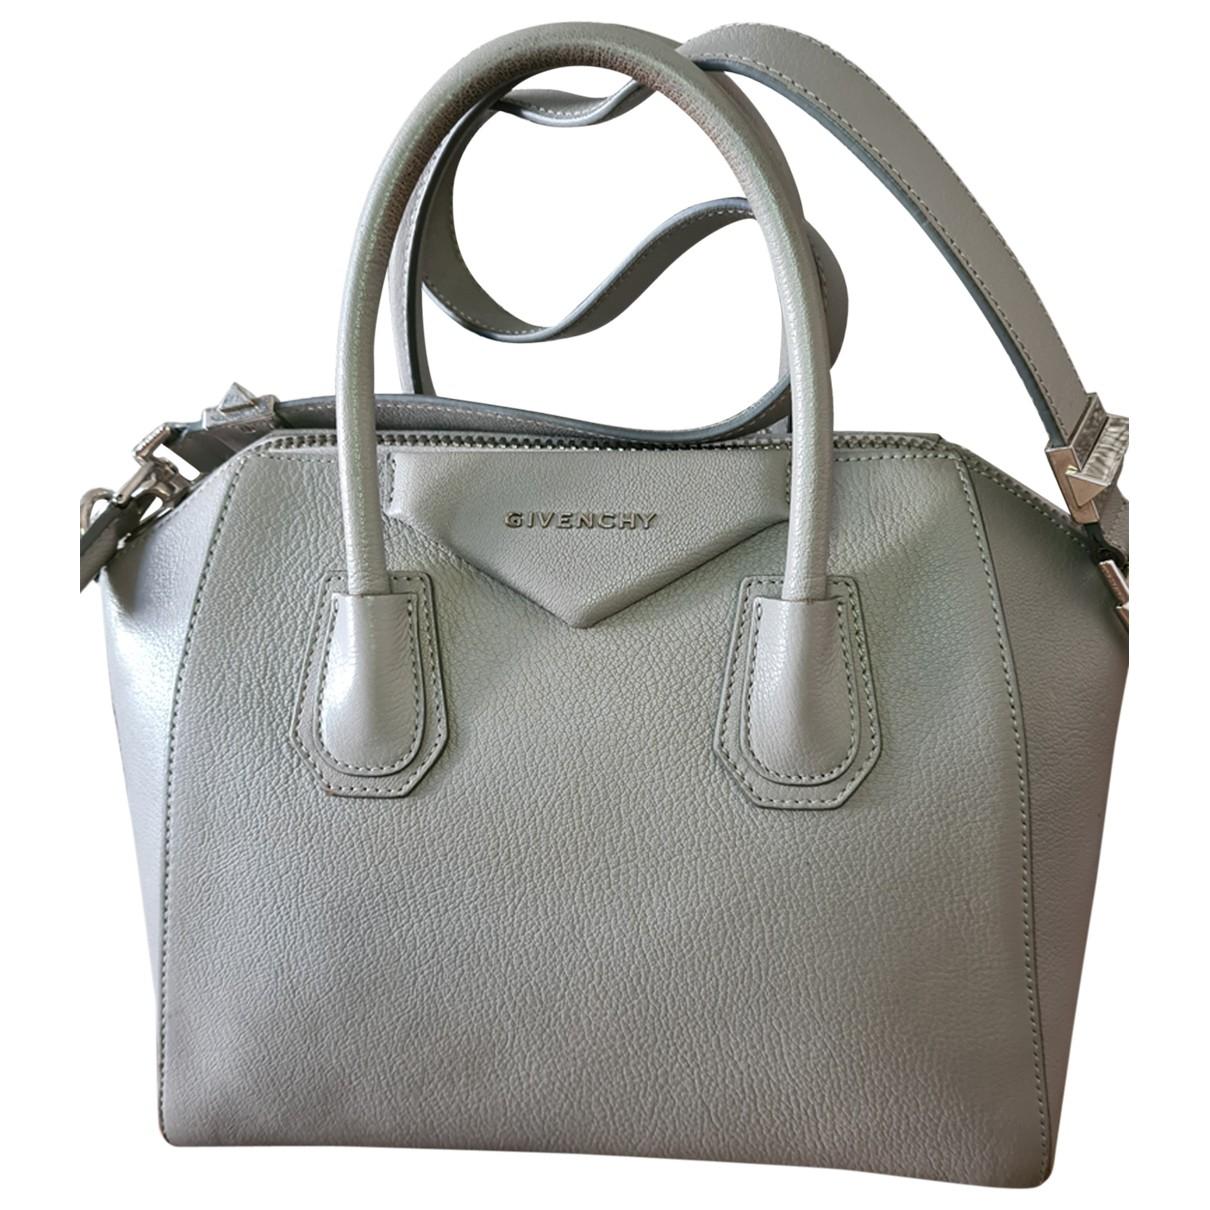 Givenchy - Sac a main Antigona pour femme en cuir - gris